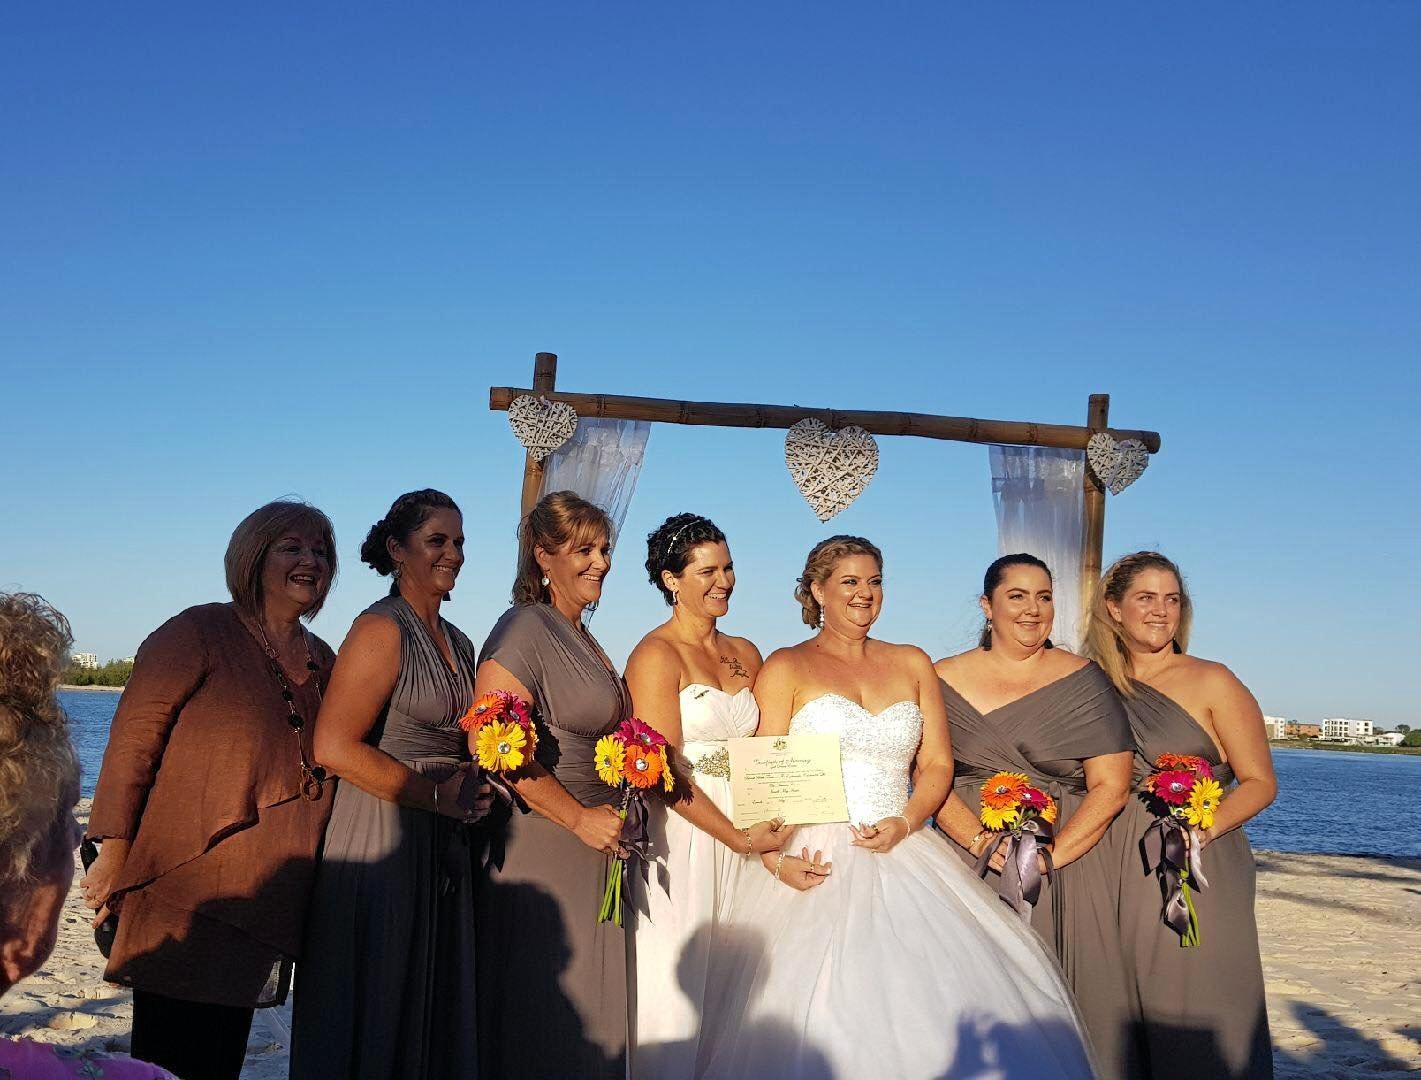 (L-R) Gail Evens (celebrant) Kim Reibel, Evonne Craven, Toni Chirio, Janelle Chirio, Penny Flanigan and Melissa Petty.